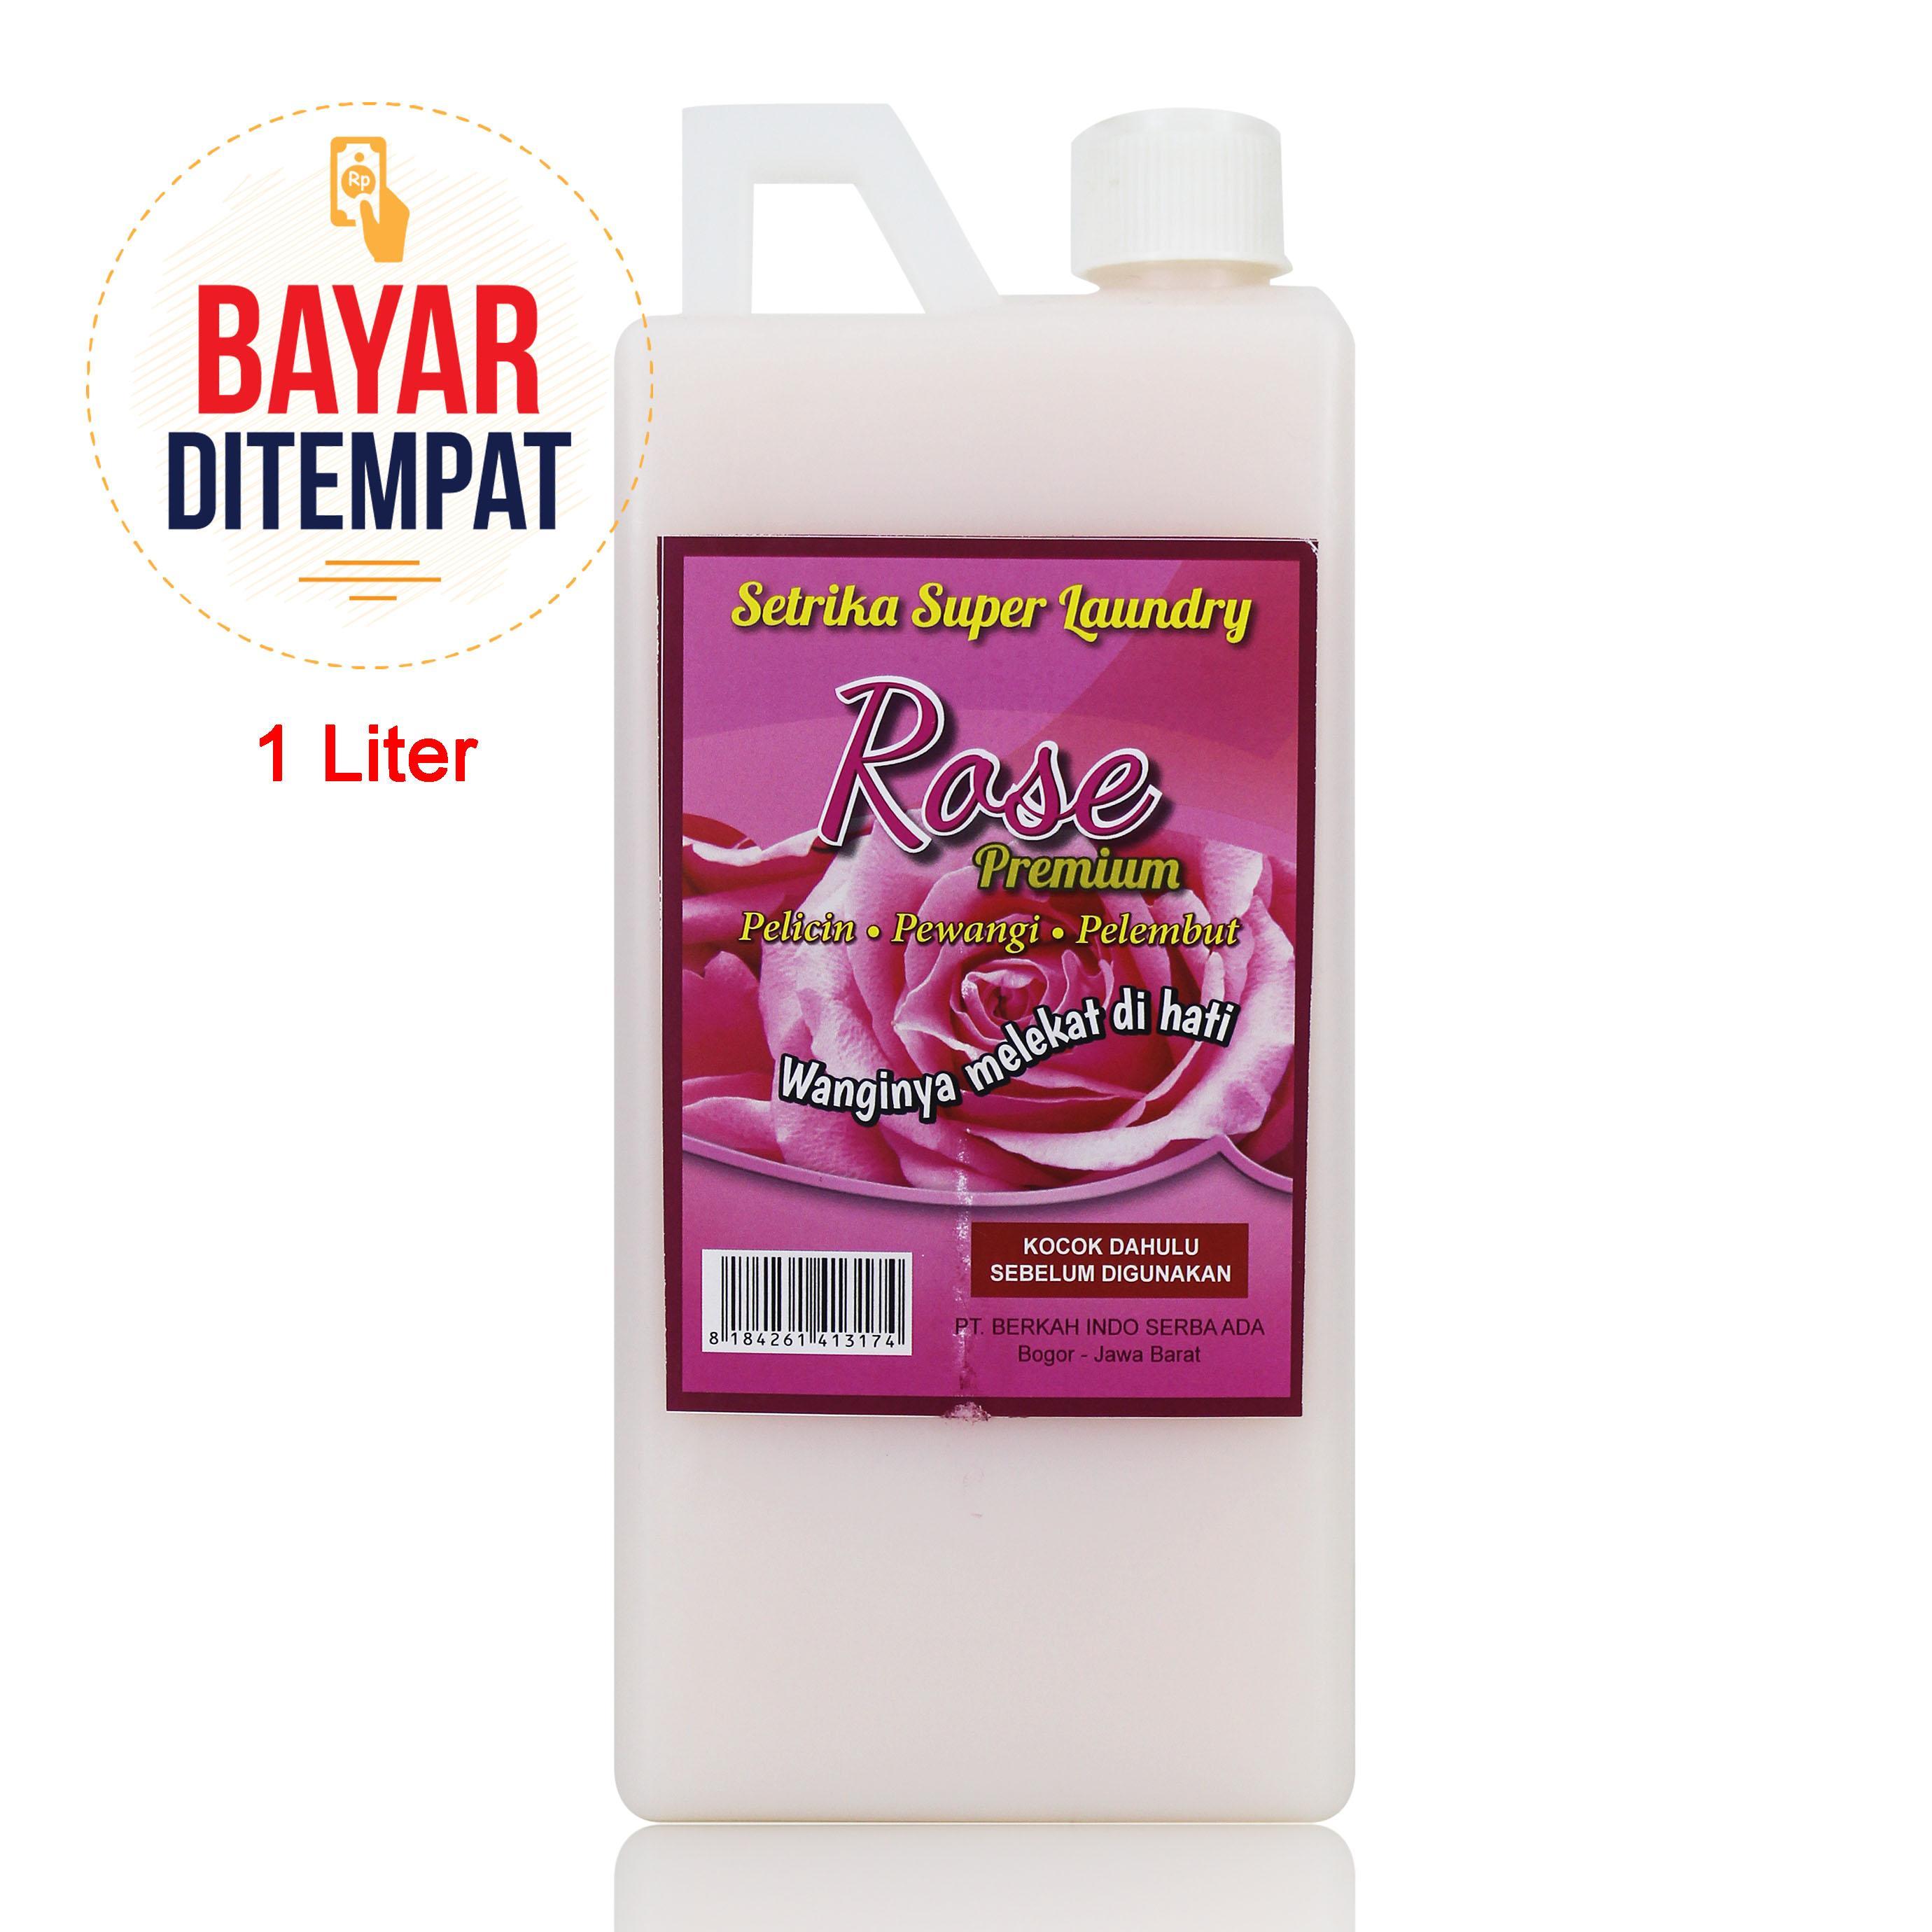 Hiber Clean - Pewangi & Pelicin Setrika Rose Premium Laundry [Candy]